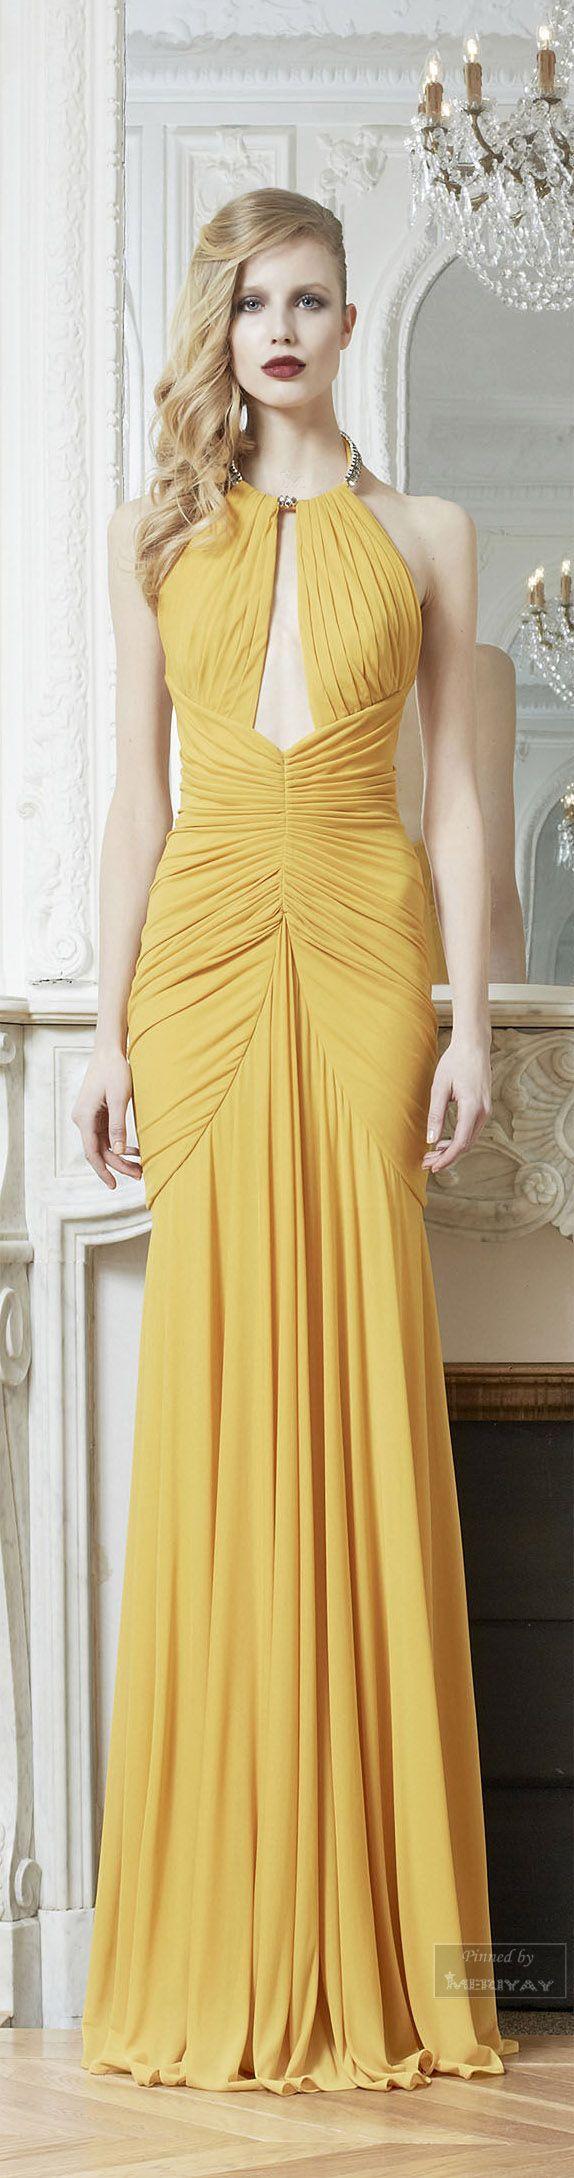 Wedding dress designers wedding dressses and zuhair murad on pinterest